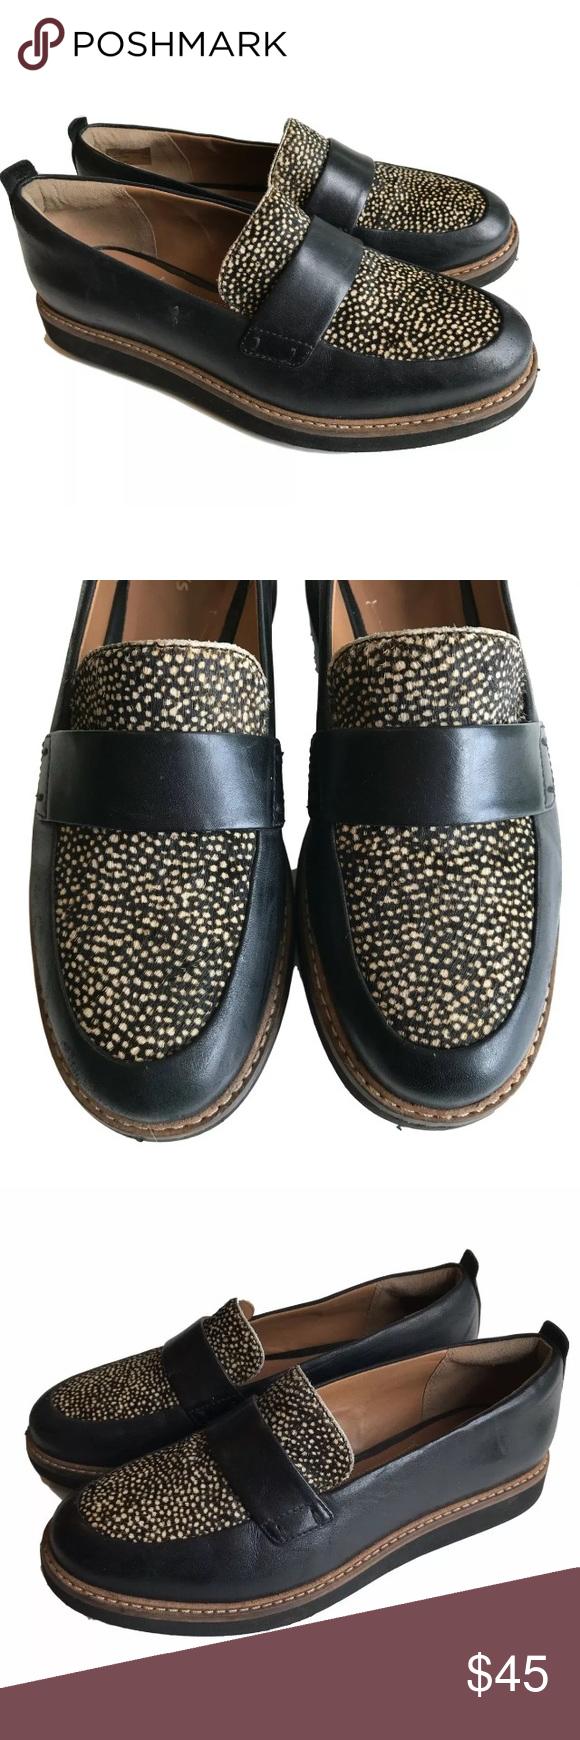 280de6deef3 Clarks Artisan Brown Loafers Calf Hair Size 5.5 Women s Clarks Artison Glick  Avalee brown leather slip